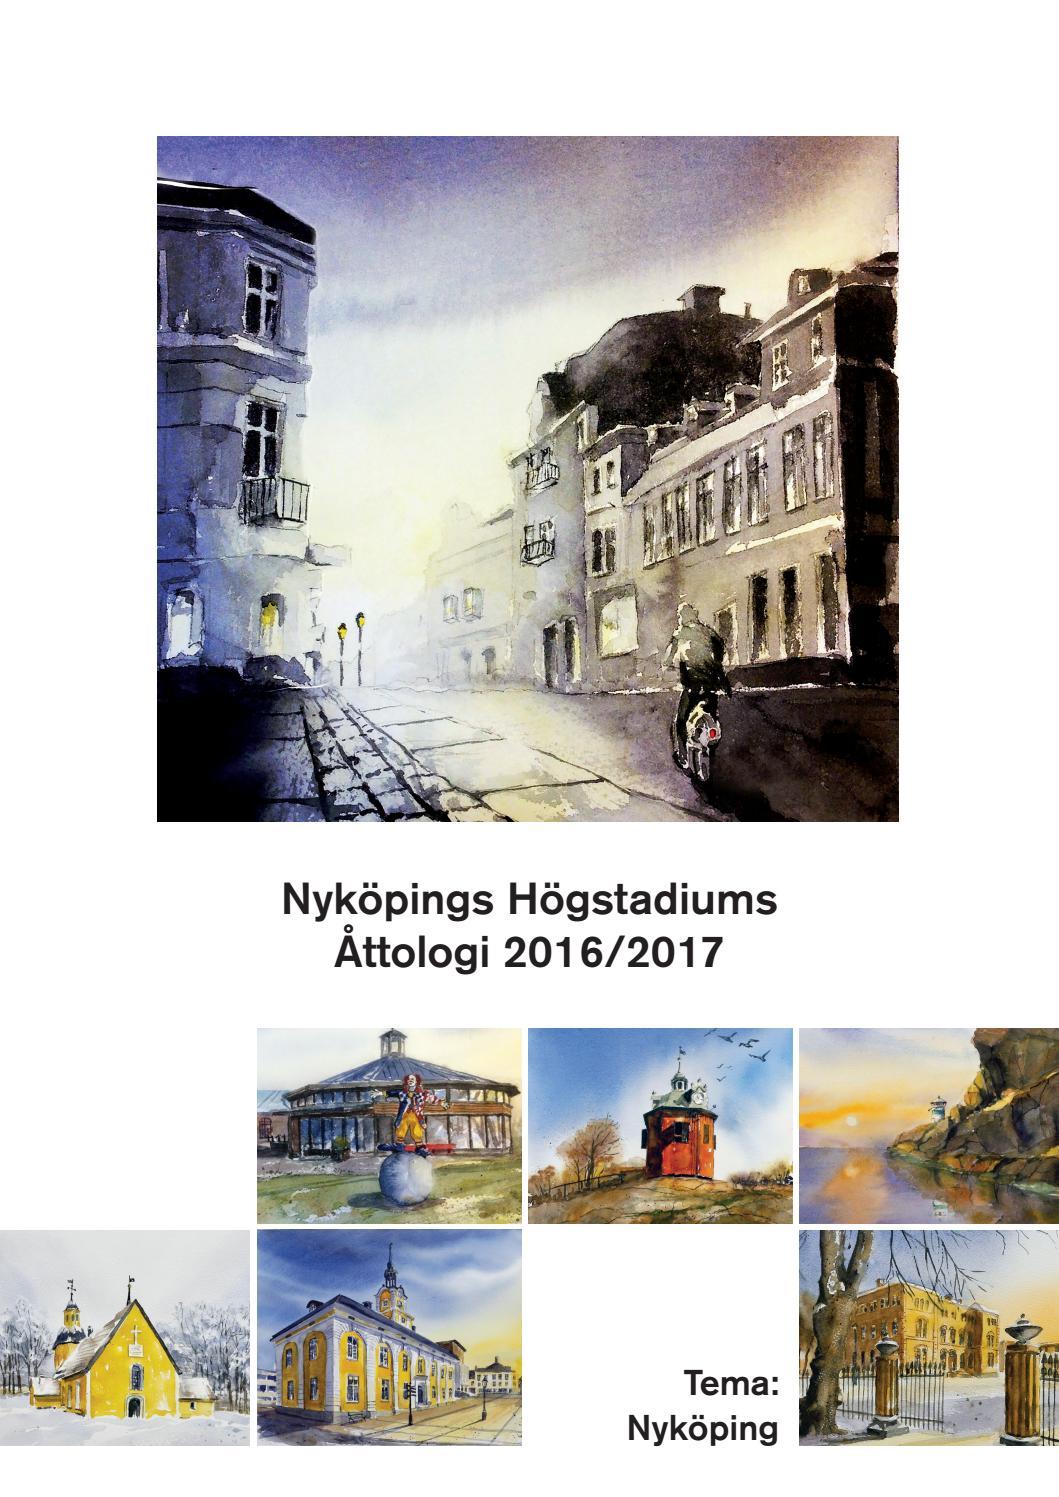 Danielle Gabrielsson, Hjortronvgen 88, Nykping | unam.net